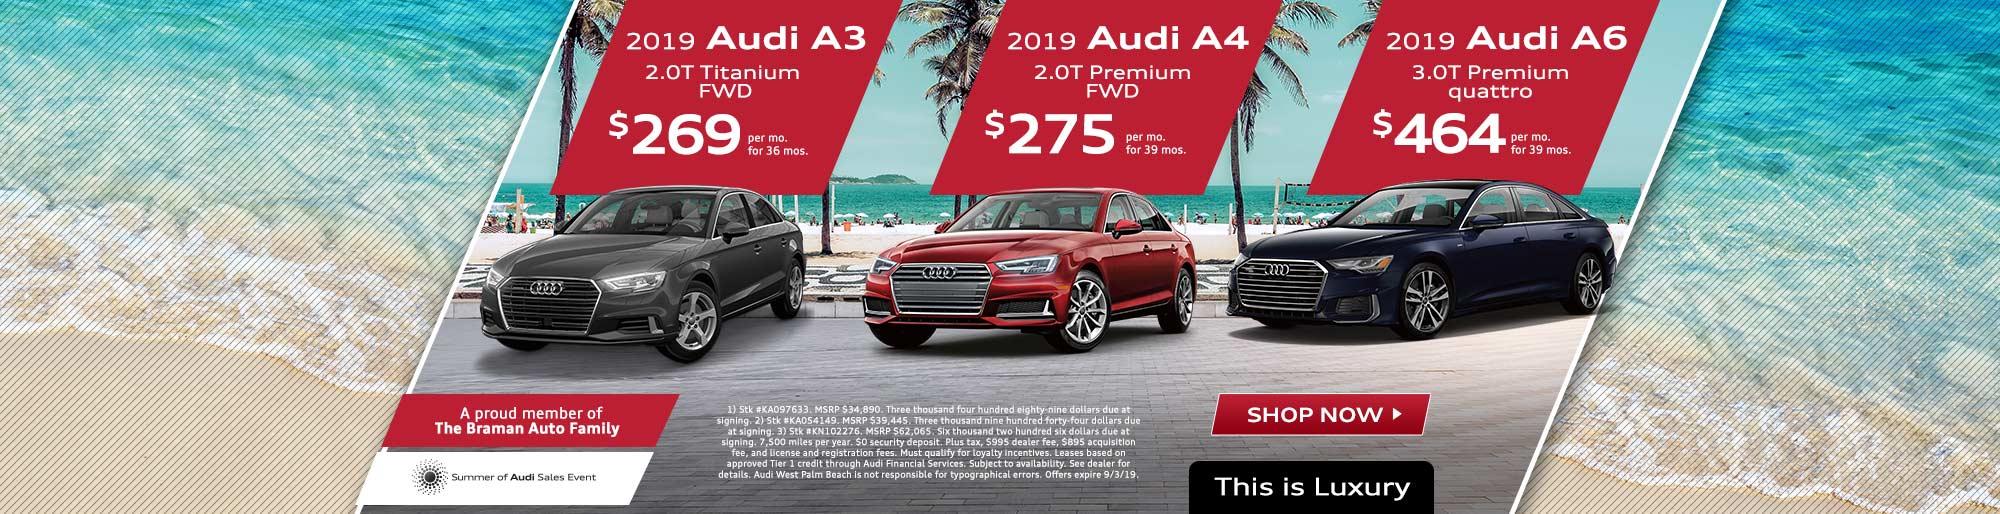 Audi West Palm Beach | Audi Dealer West Palm Beach FL